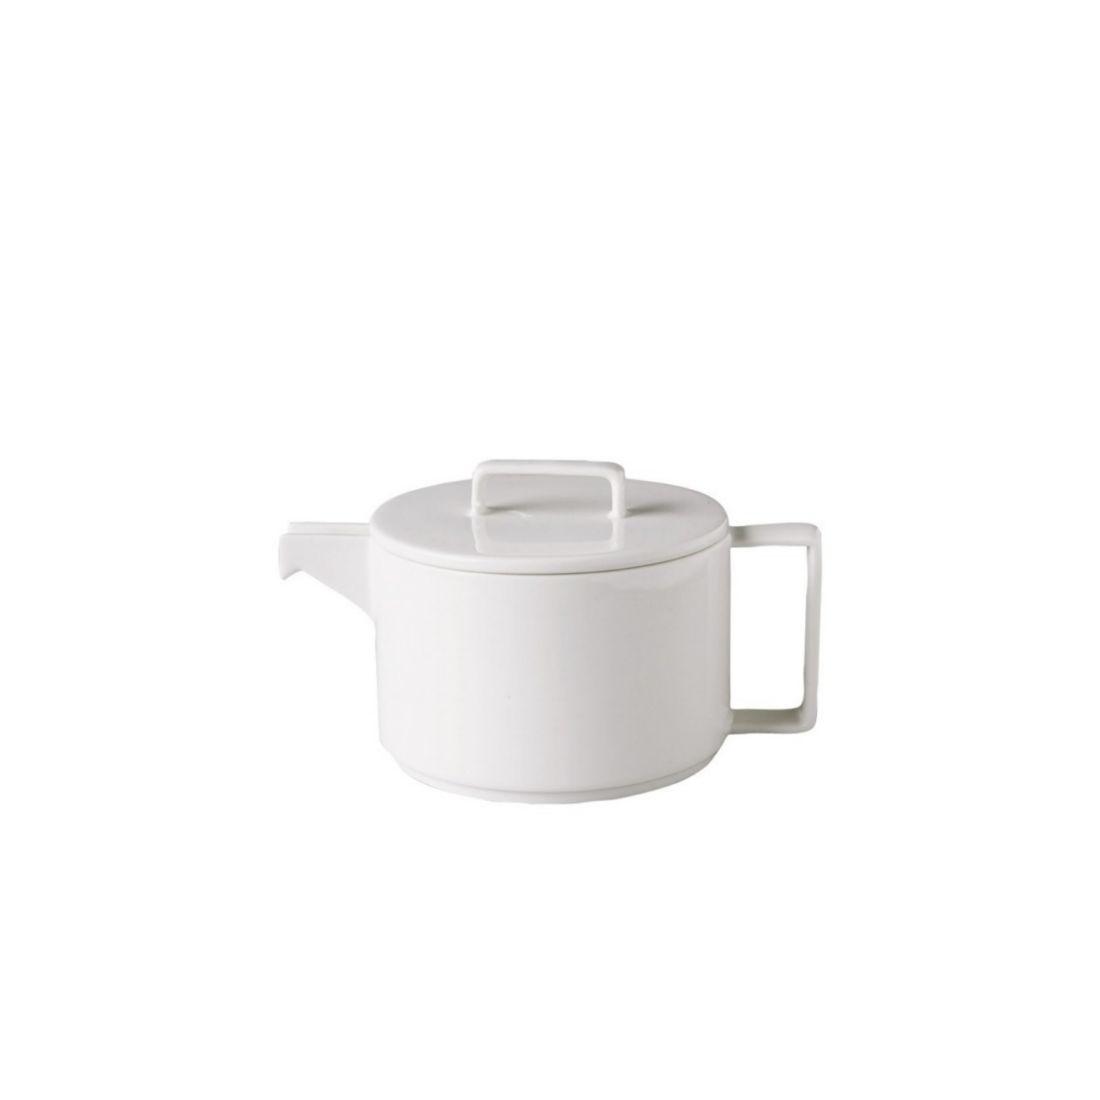 RAK Konvice na čaj s víčkem 1000 ml Nordic